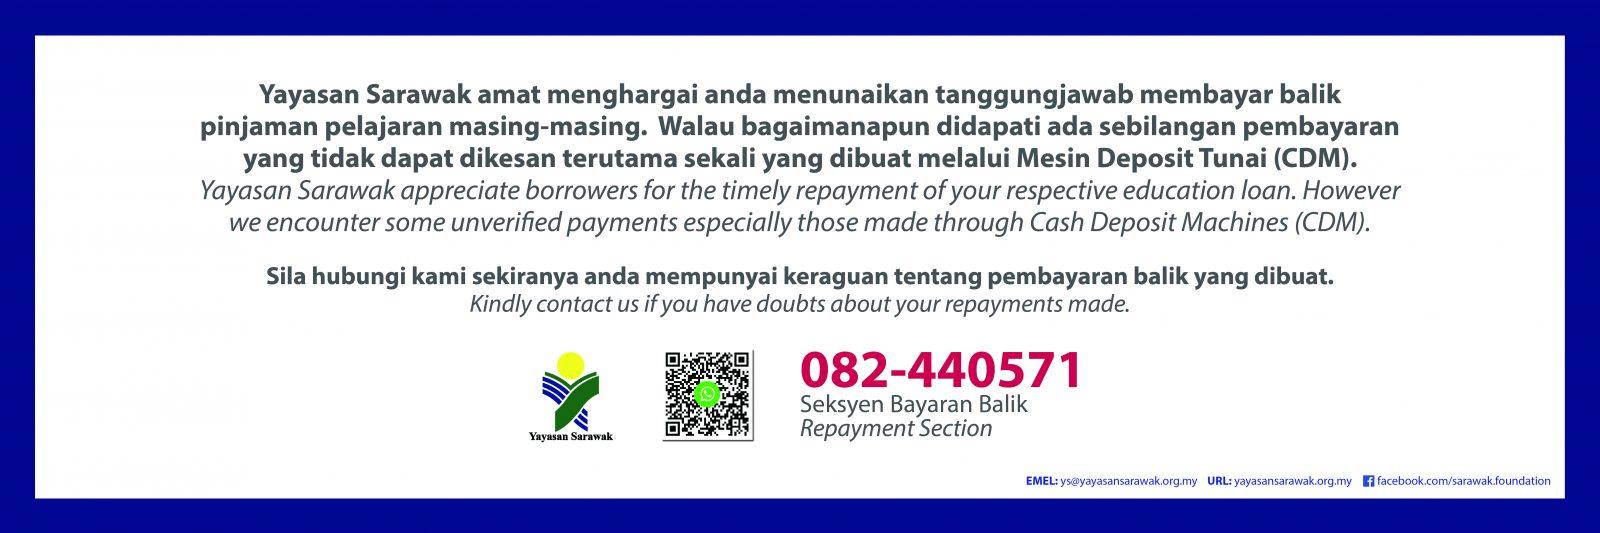 Yayasan Sarawak The Sarawak Foundation